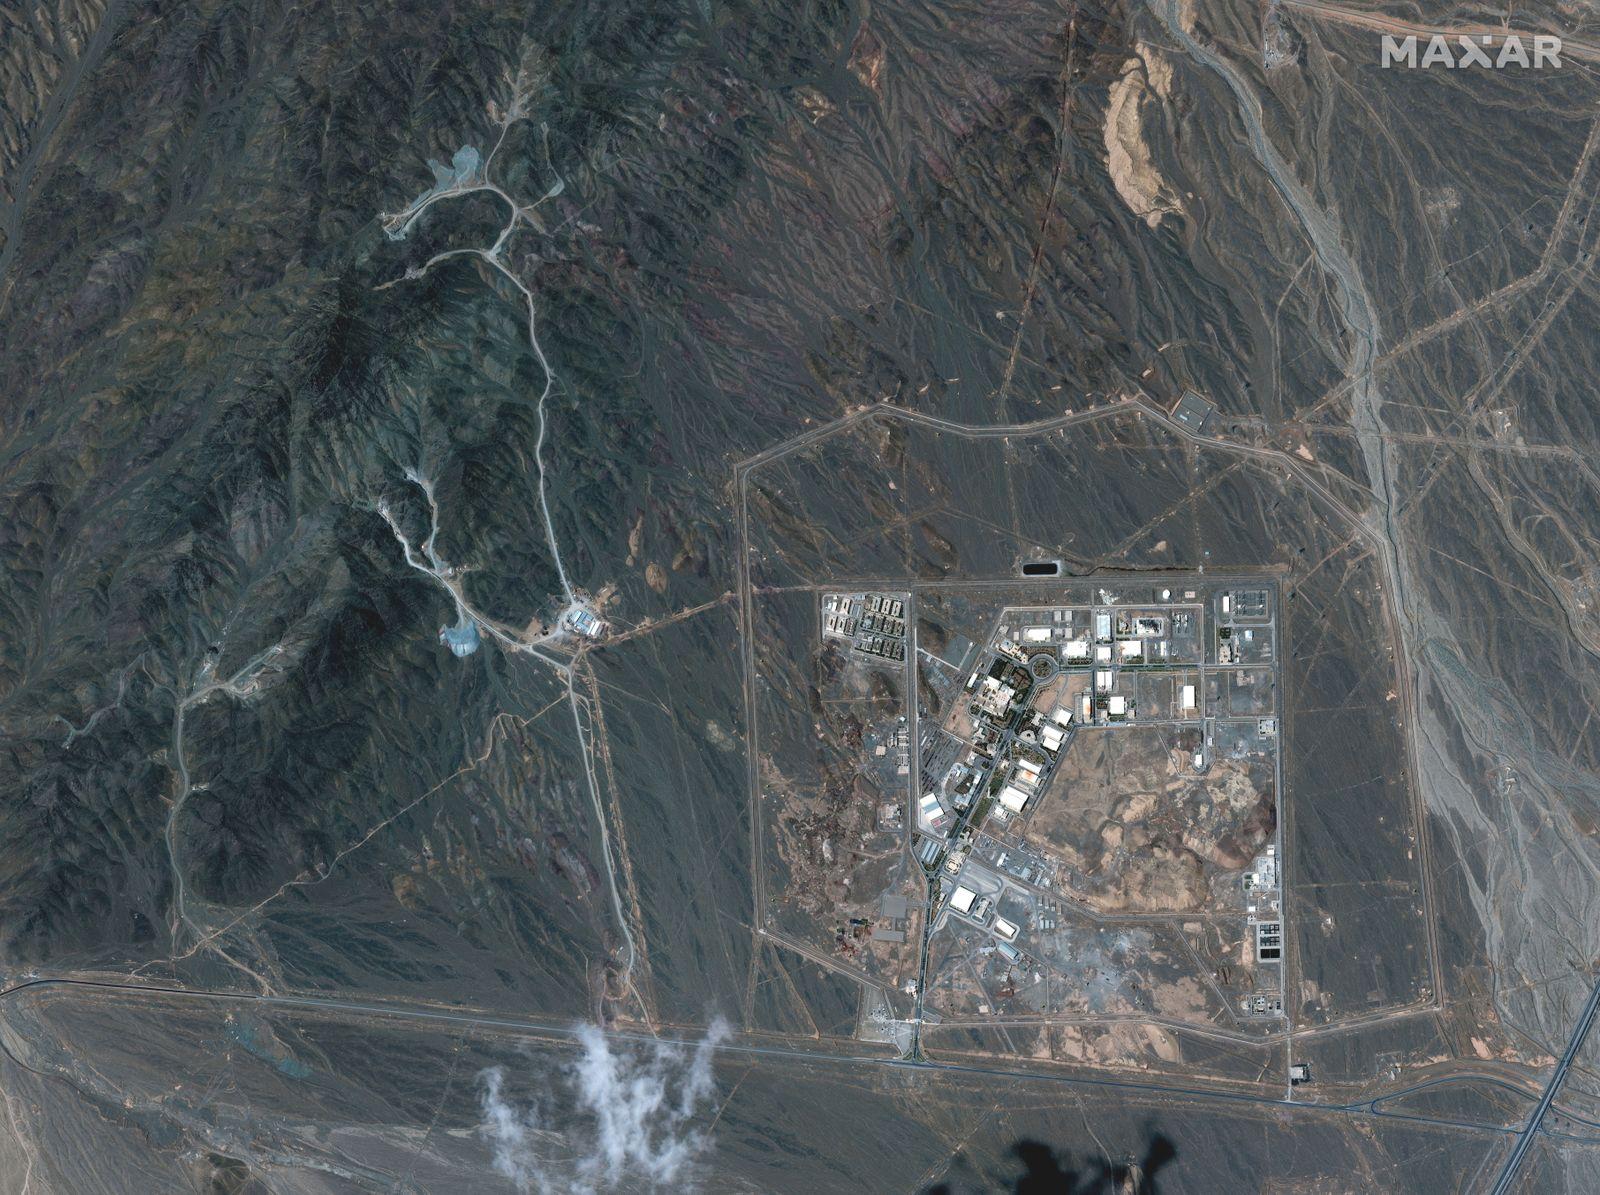 A view of the Natanz uranium enrichment facility 250 km (155 miles) south of the Iranian capital Tehran